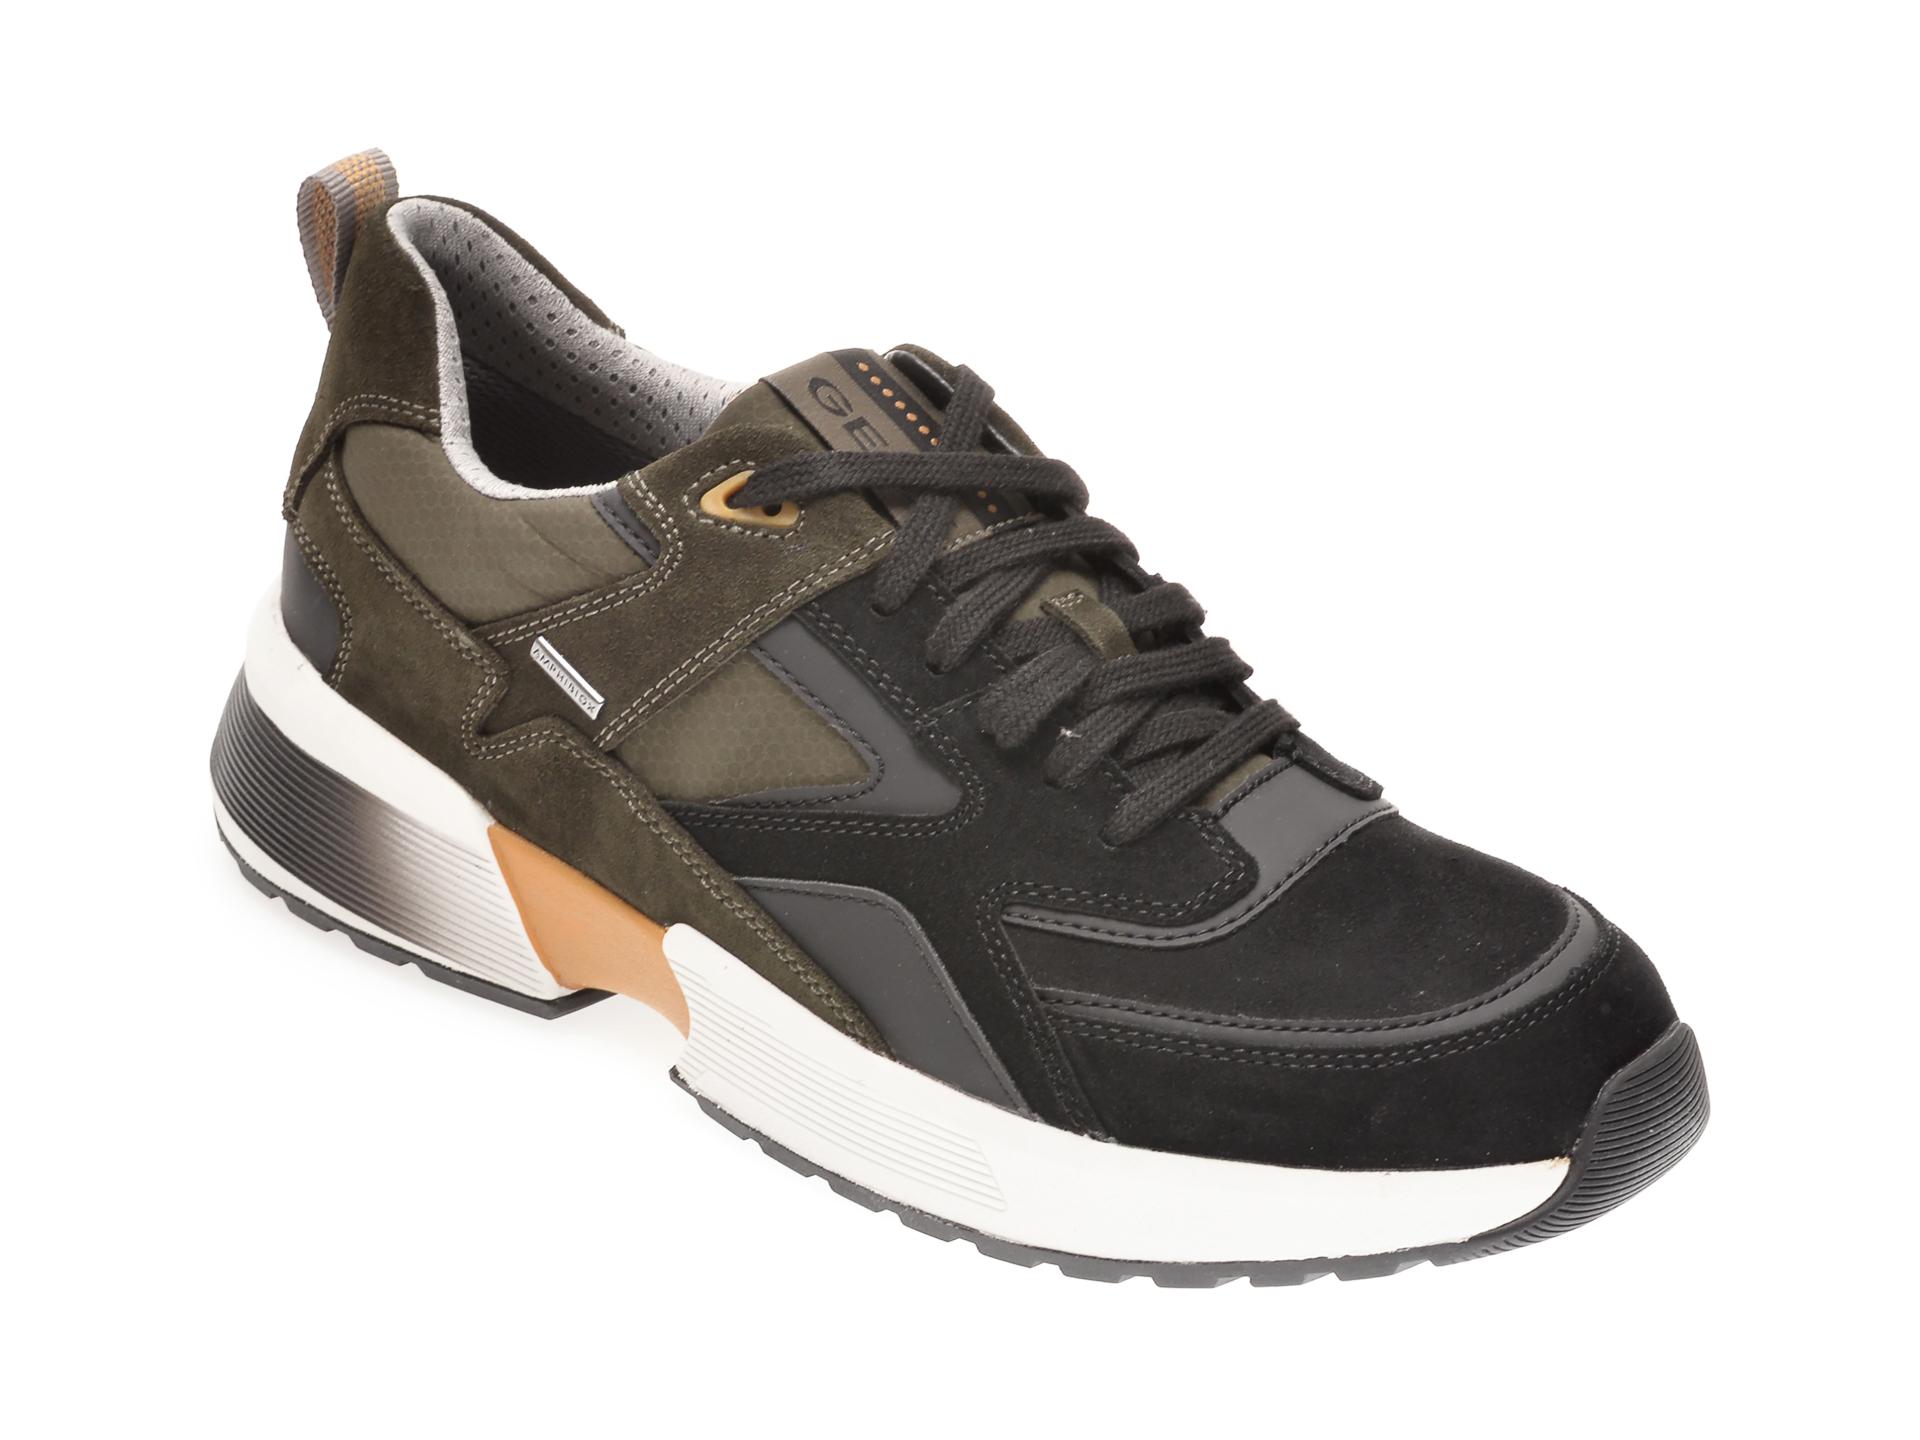 Pantofi sport GEOX negri, U04ASA, din piele naturala